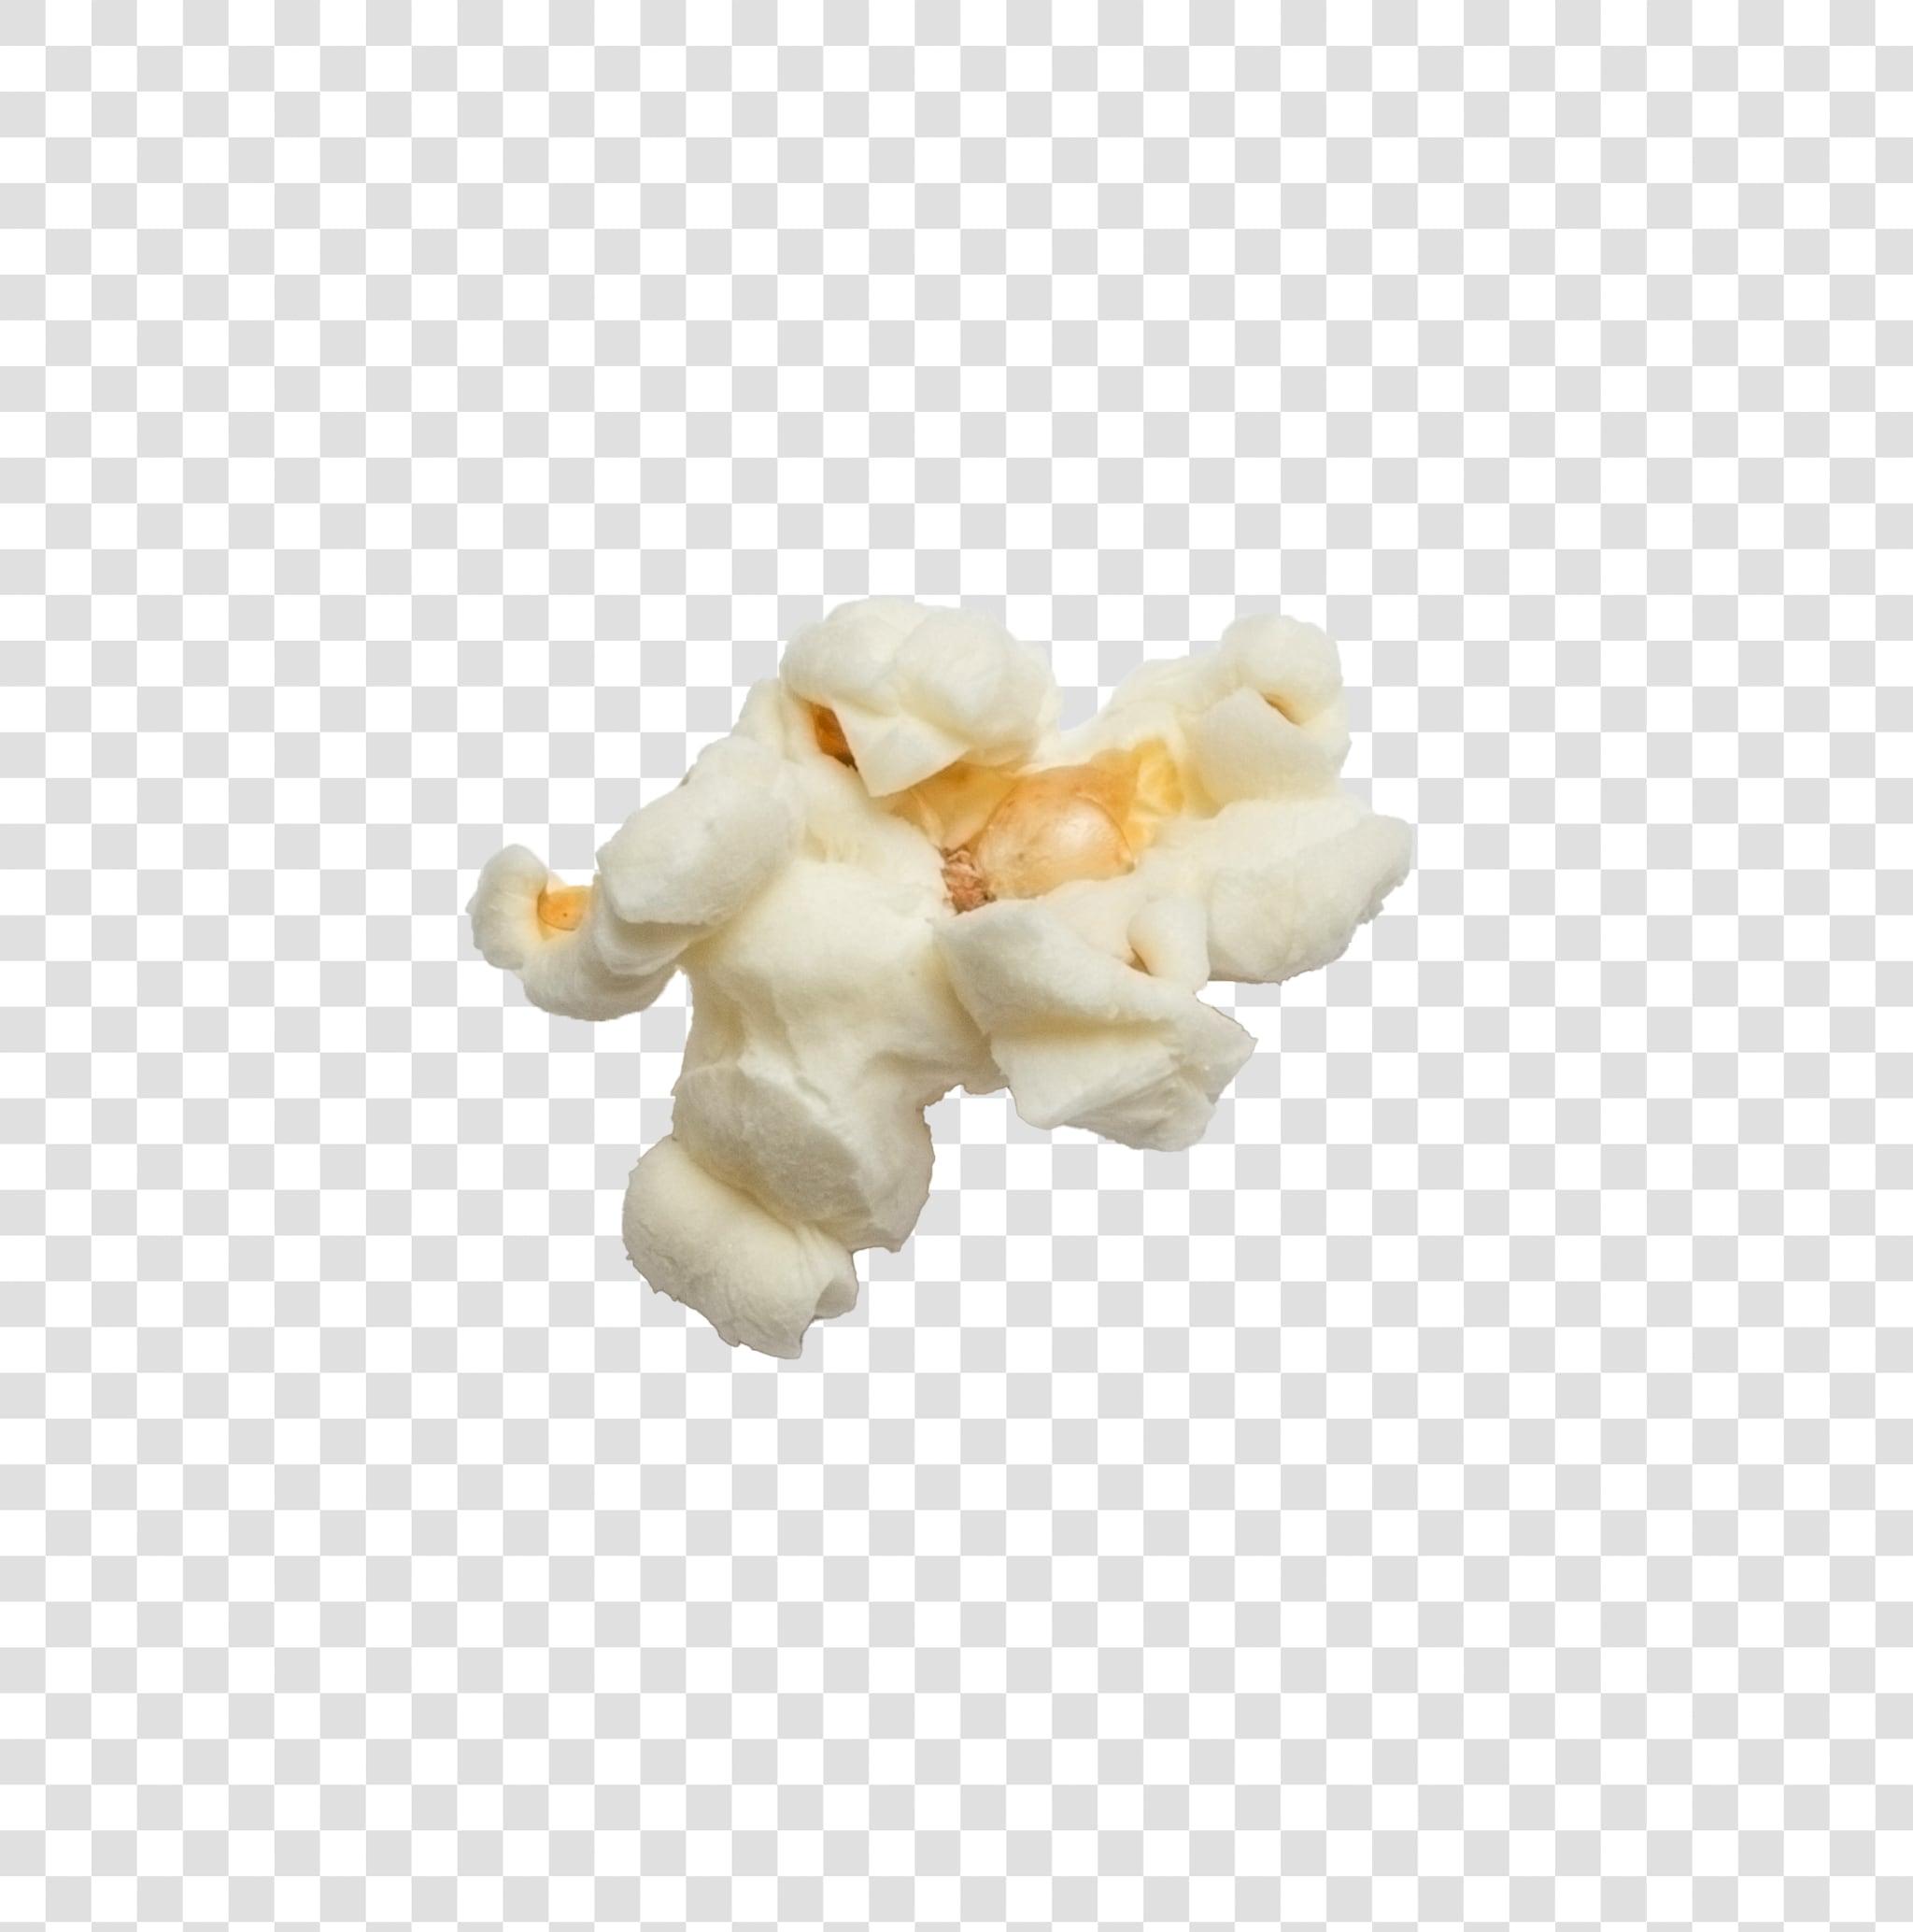 Popcorn PSD layered image